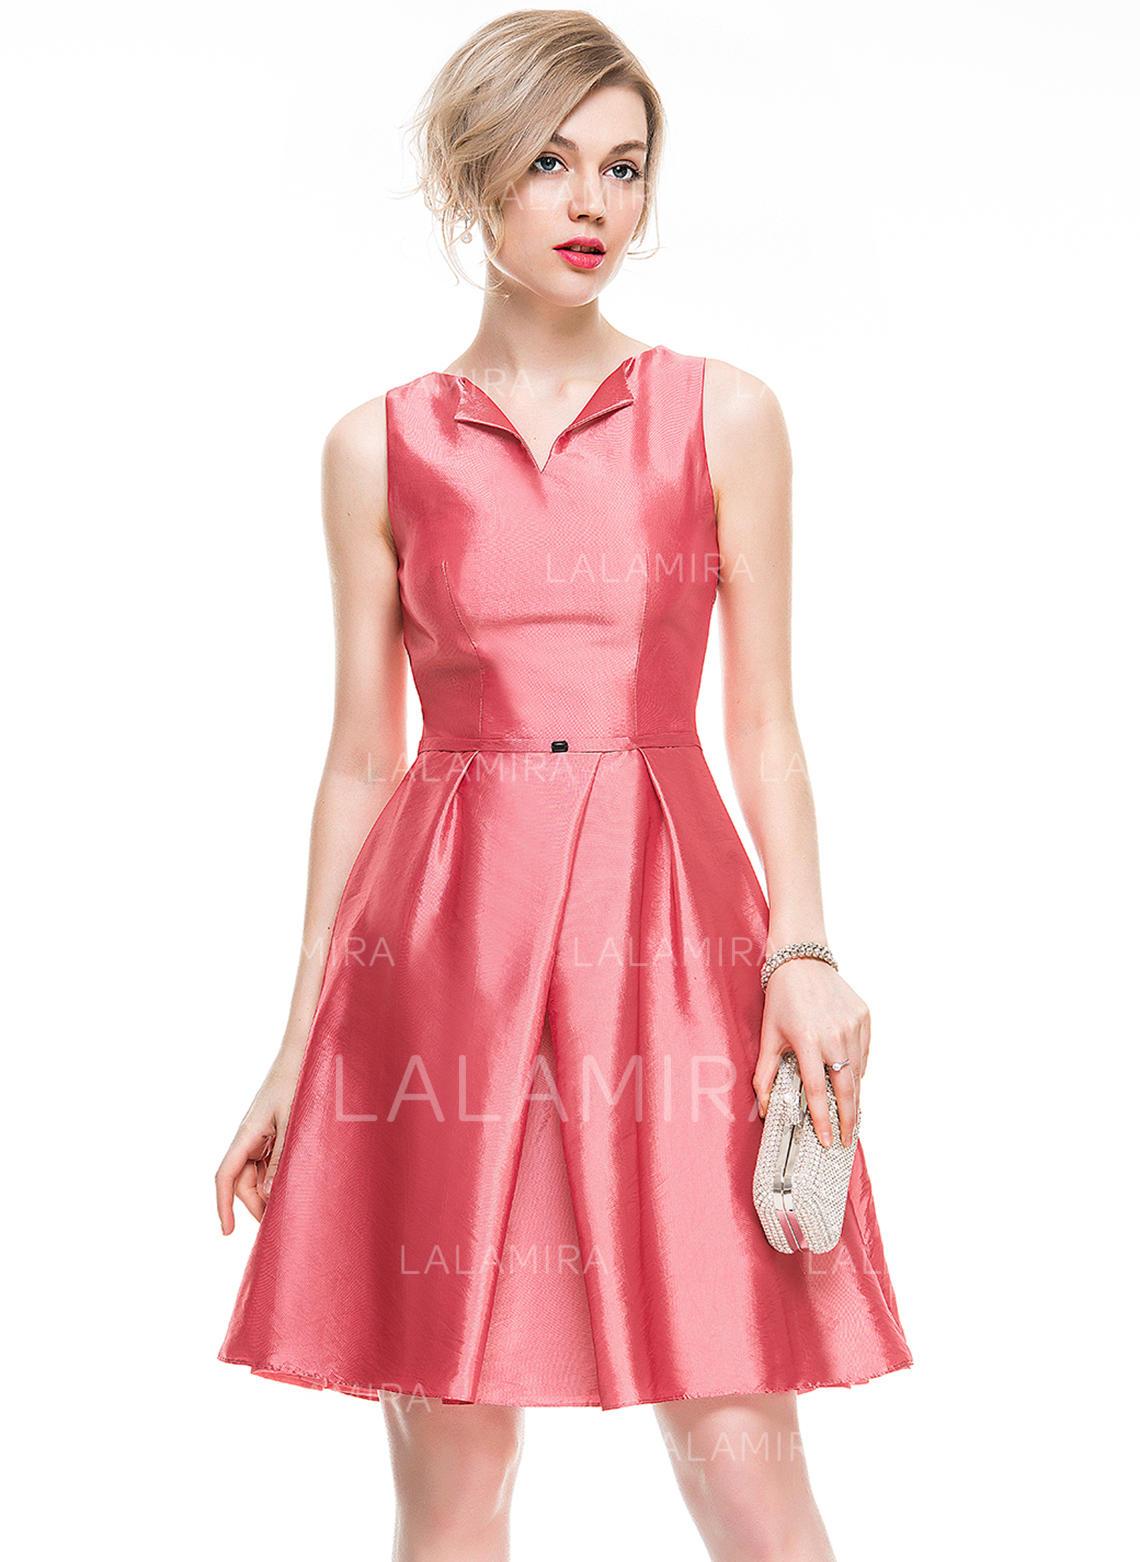 exceptional range of styles Discover sports shoes Beading A-Line/Princess V-neck Taffeta Cocktail Dresses (016077831)